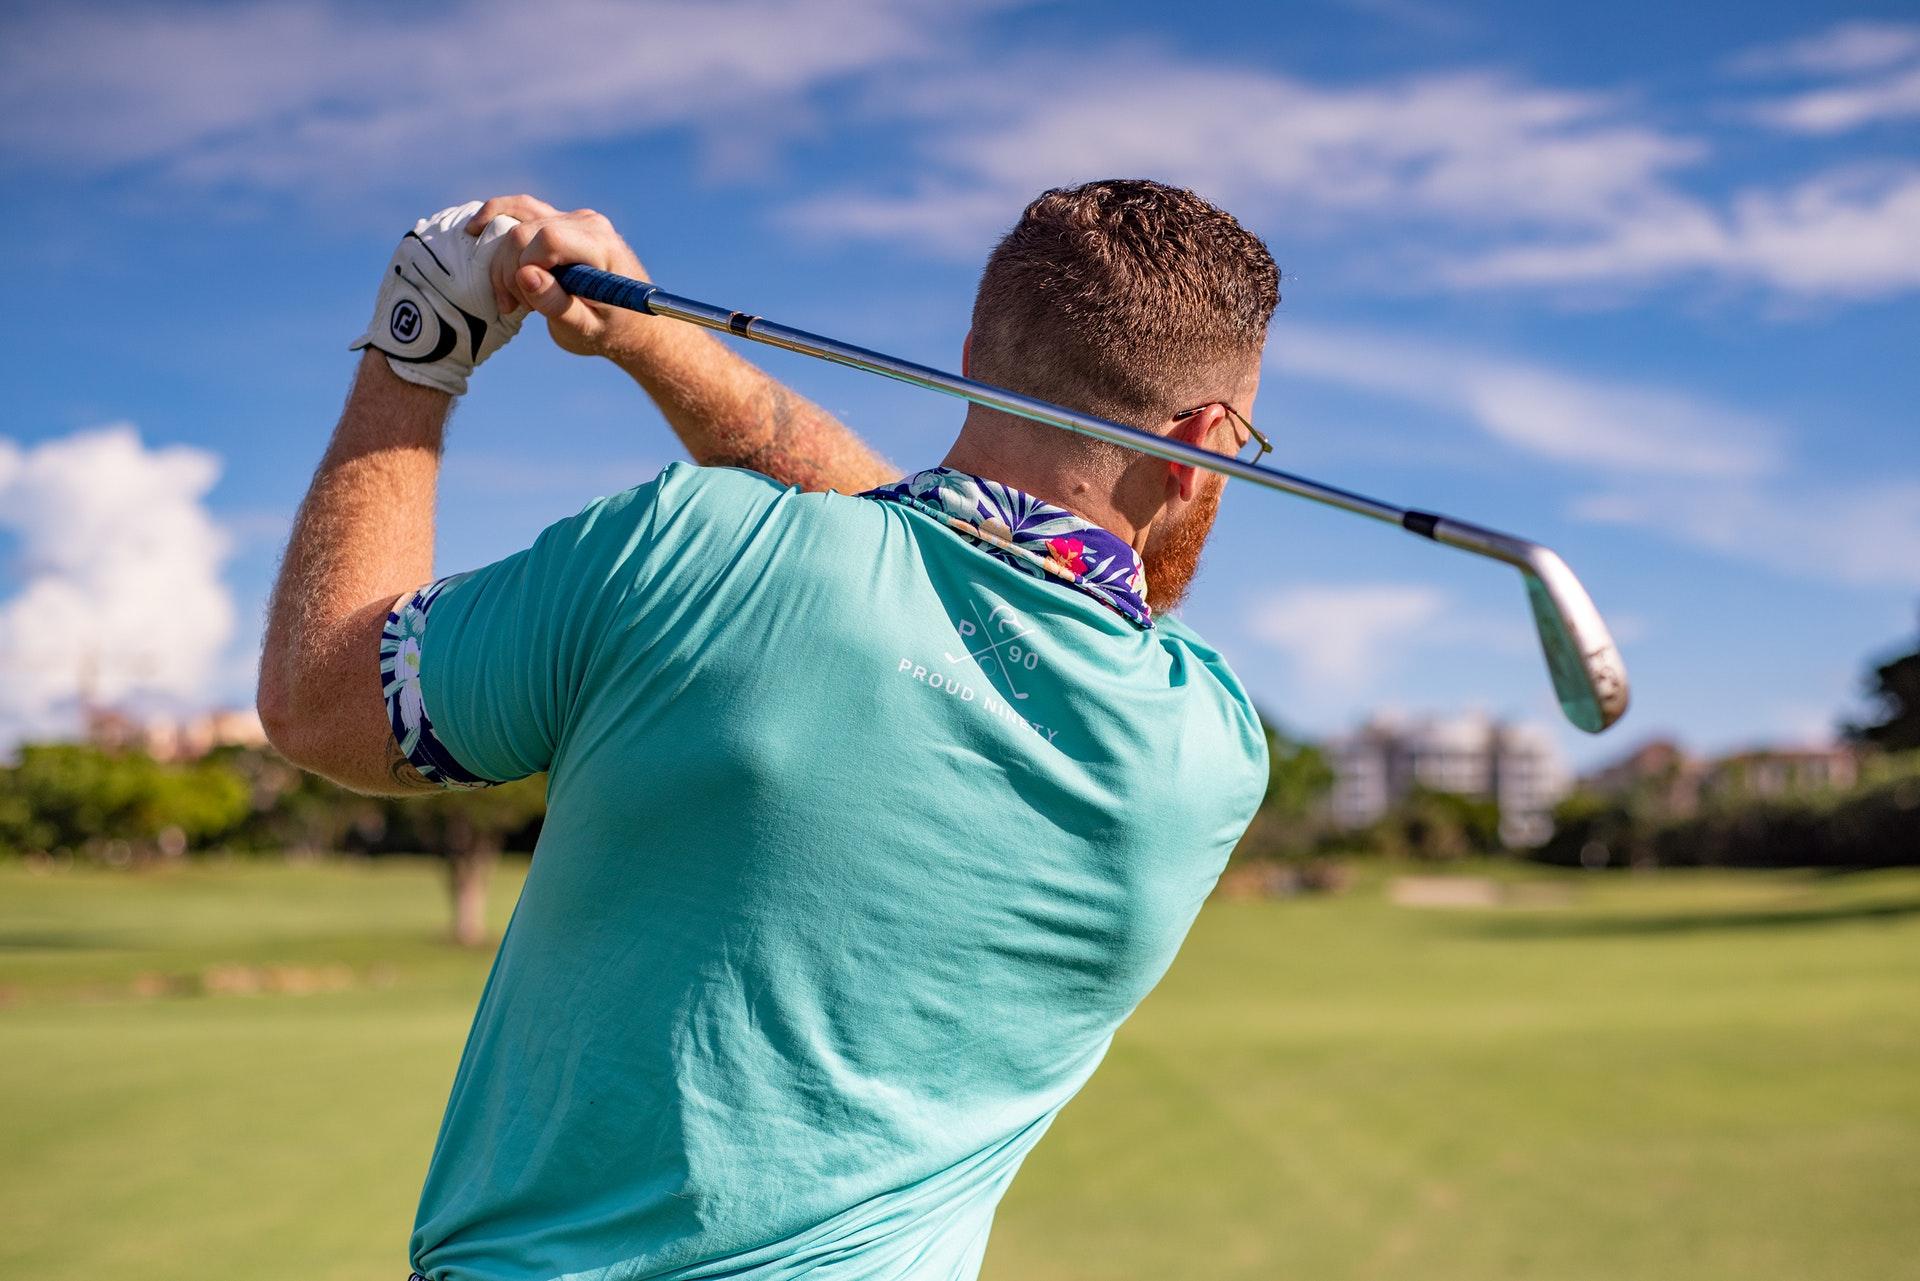 Golfer off Tee